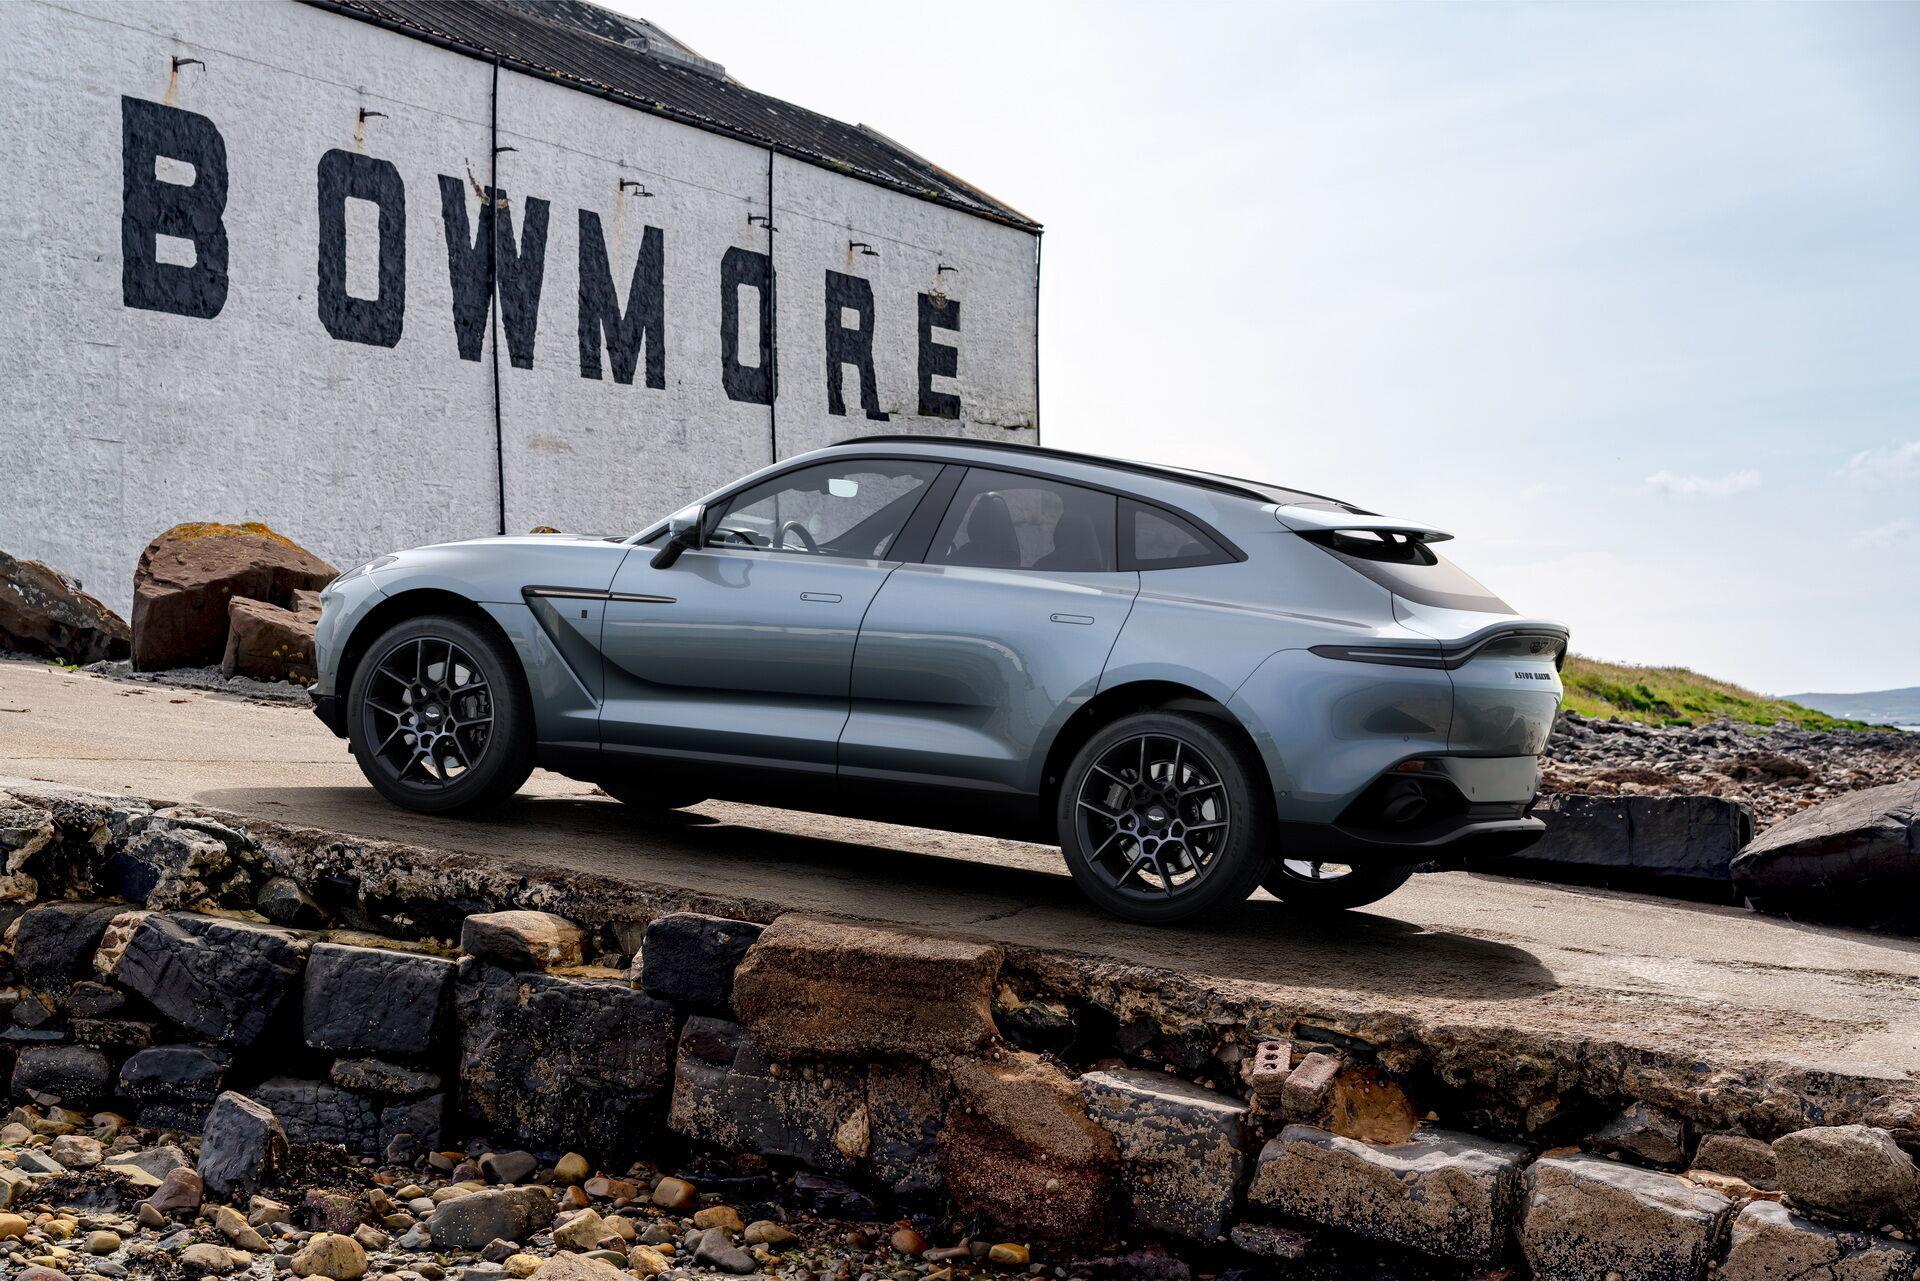 Aston Martin DBX Bowmore Edition створений фірмовим підрозділом Q by Aston Martin